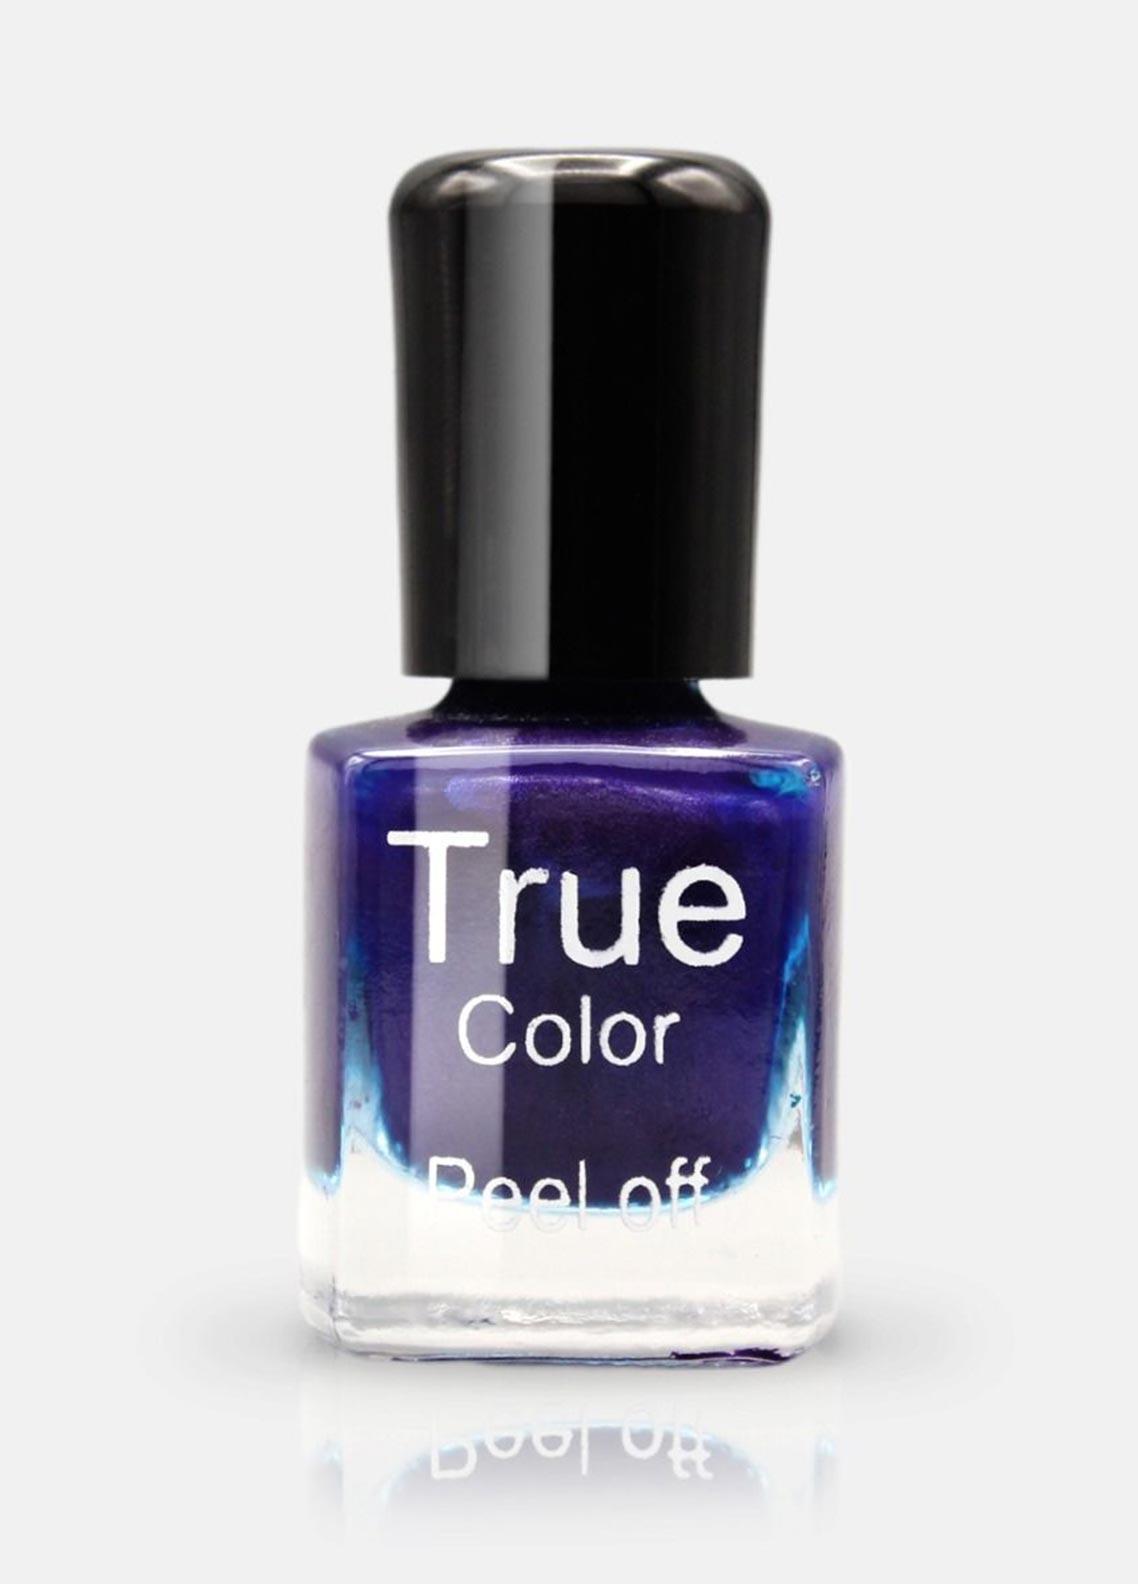 True Colors Peel Of Nail Mask-07